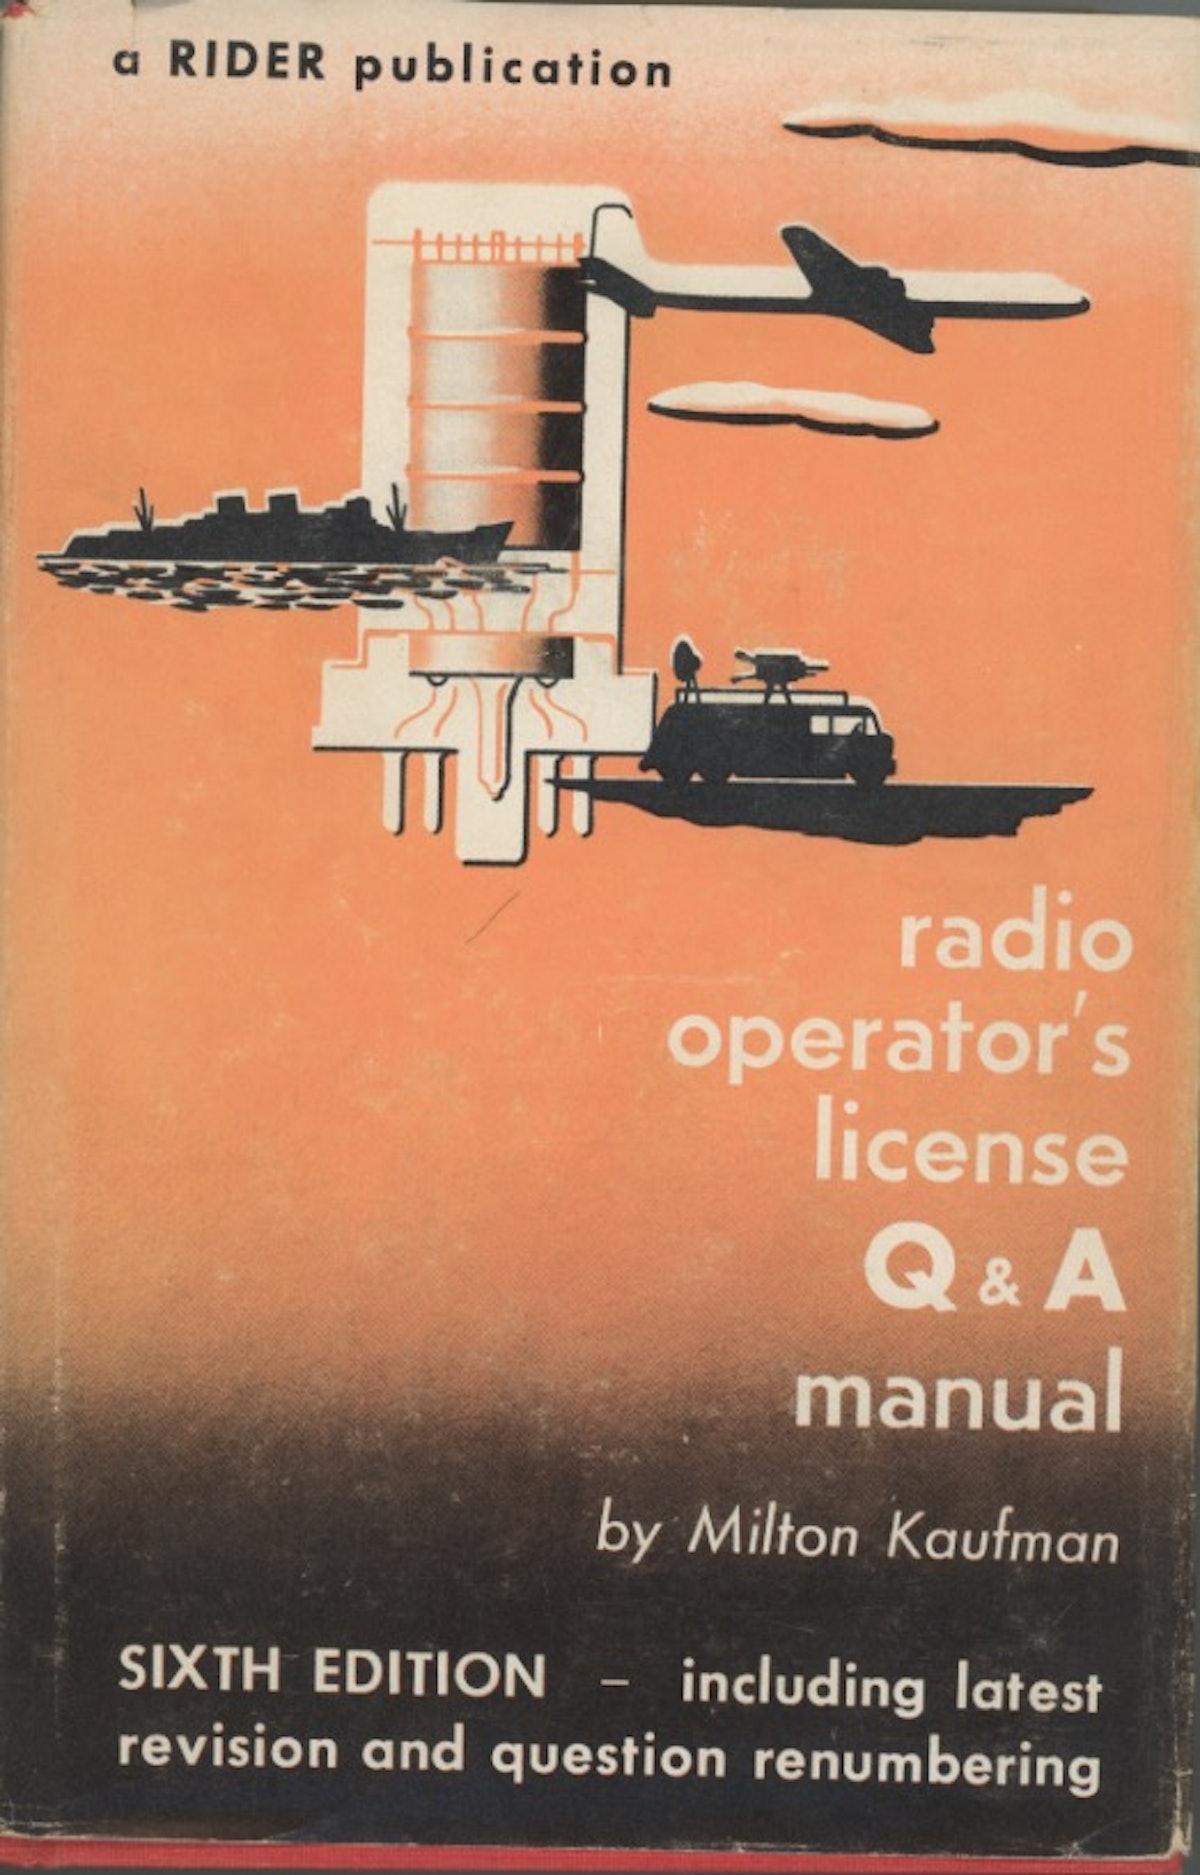 Radio Operator's License Q&A Manual